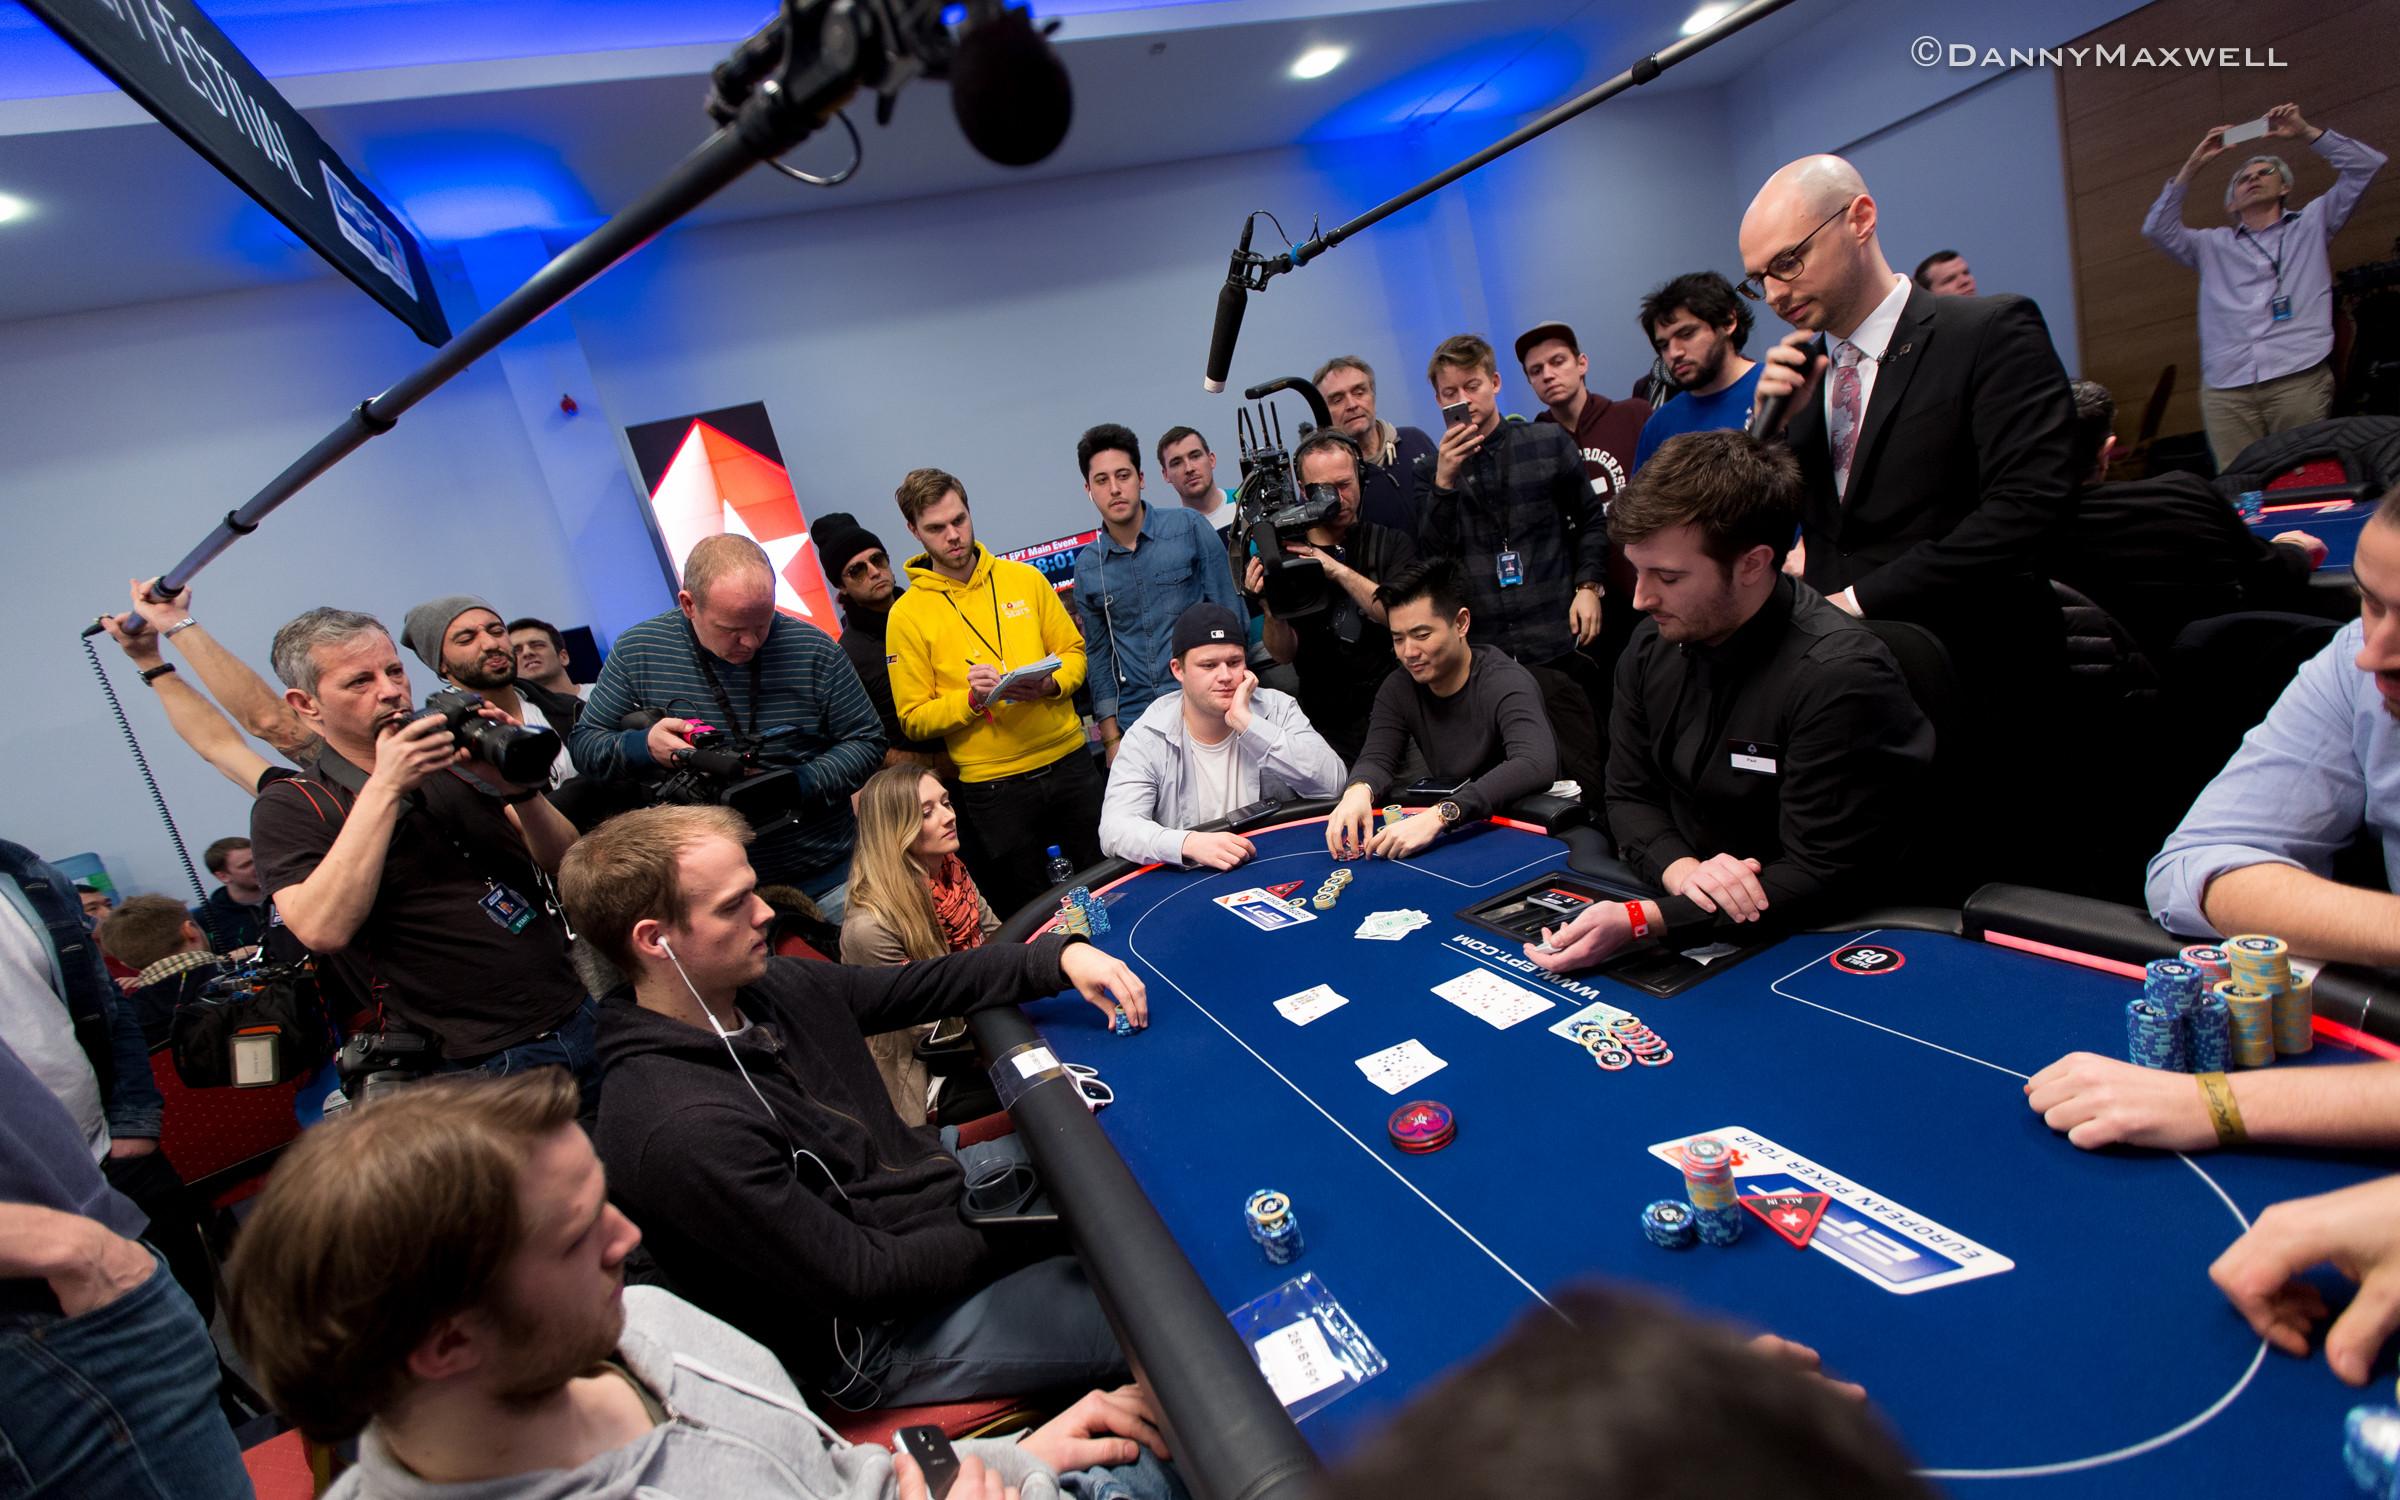 Freeroll poker dicas